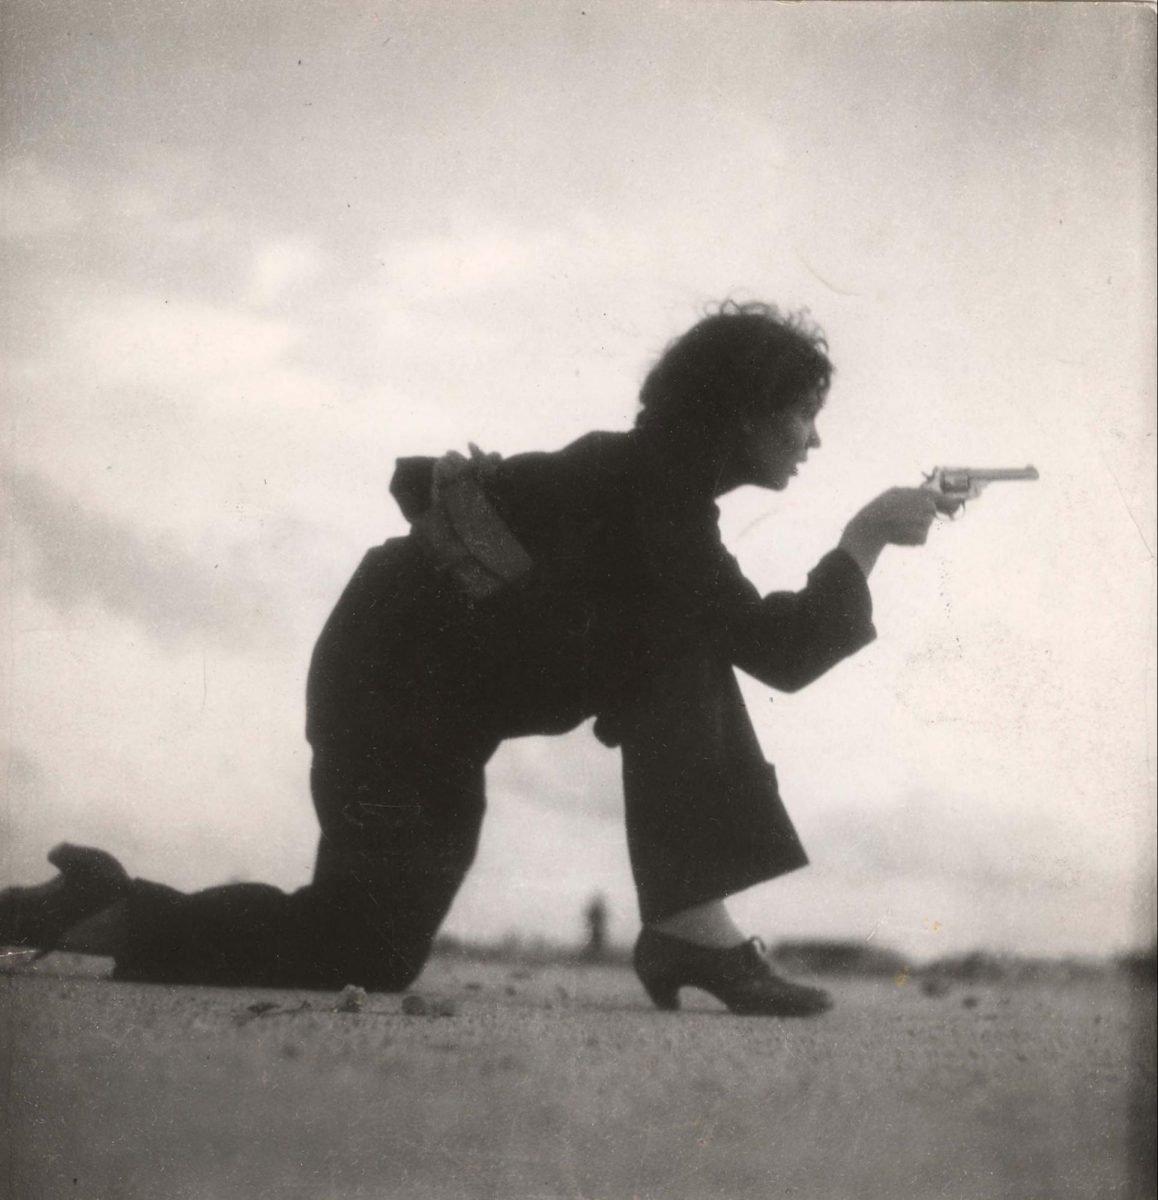 Woman training for Spanish militia, Barcelona, 1936 © Gerda Taro Legendary Women in Photography